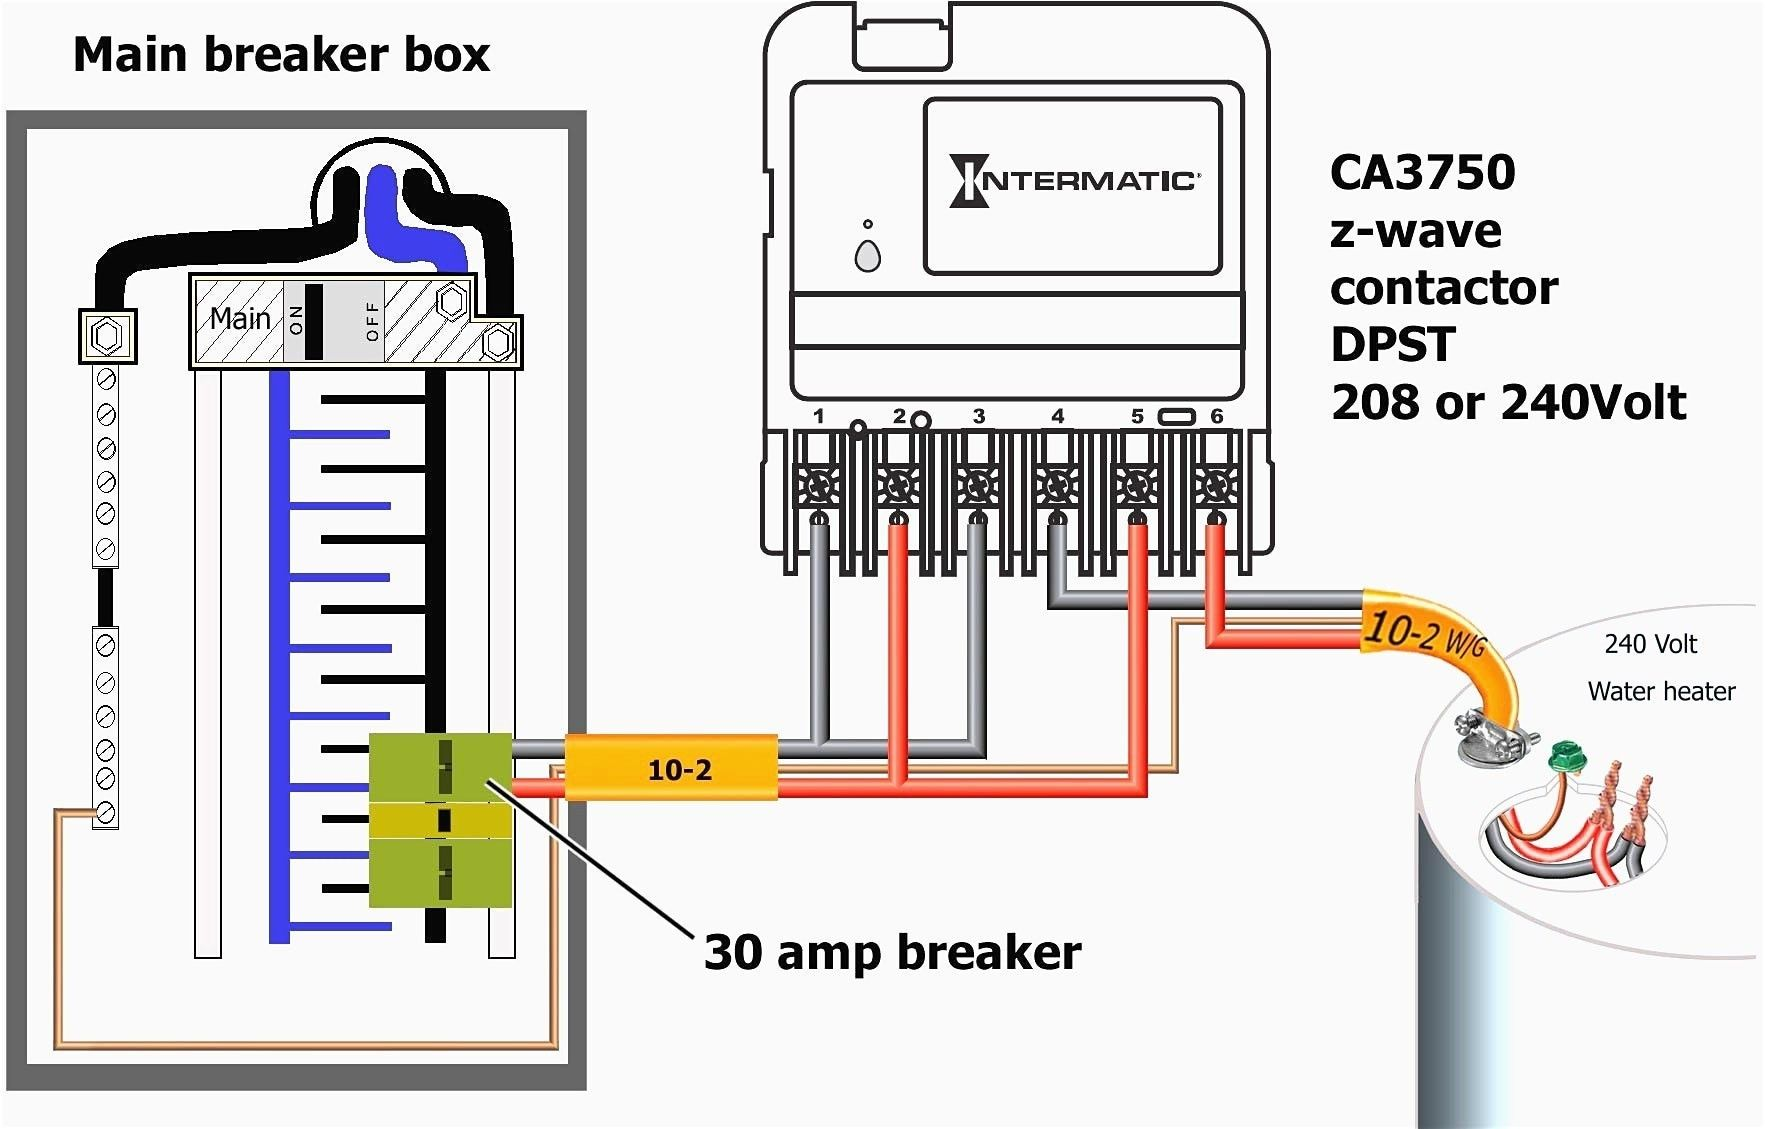 New Simple Contactor Wiring Diagram Gfci, Breaker box, 3